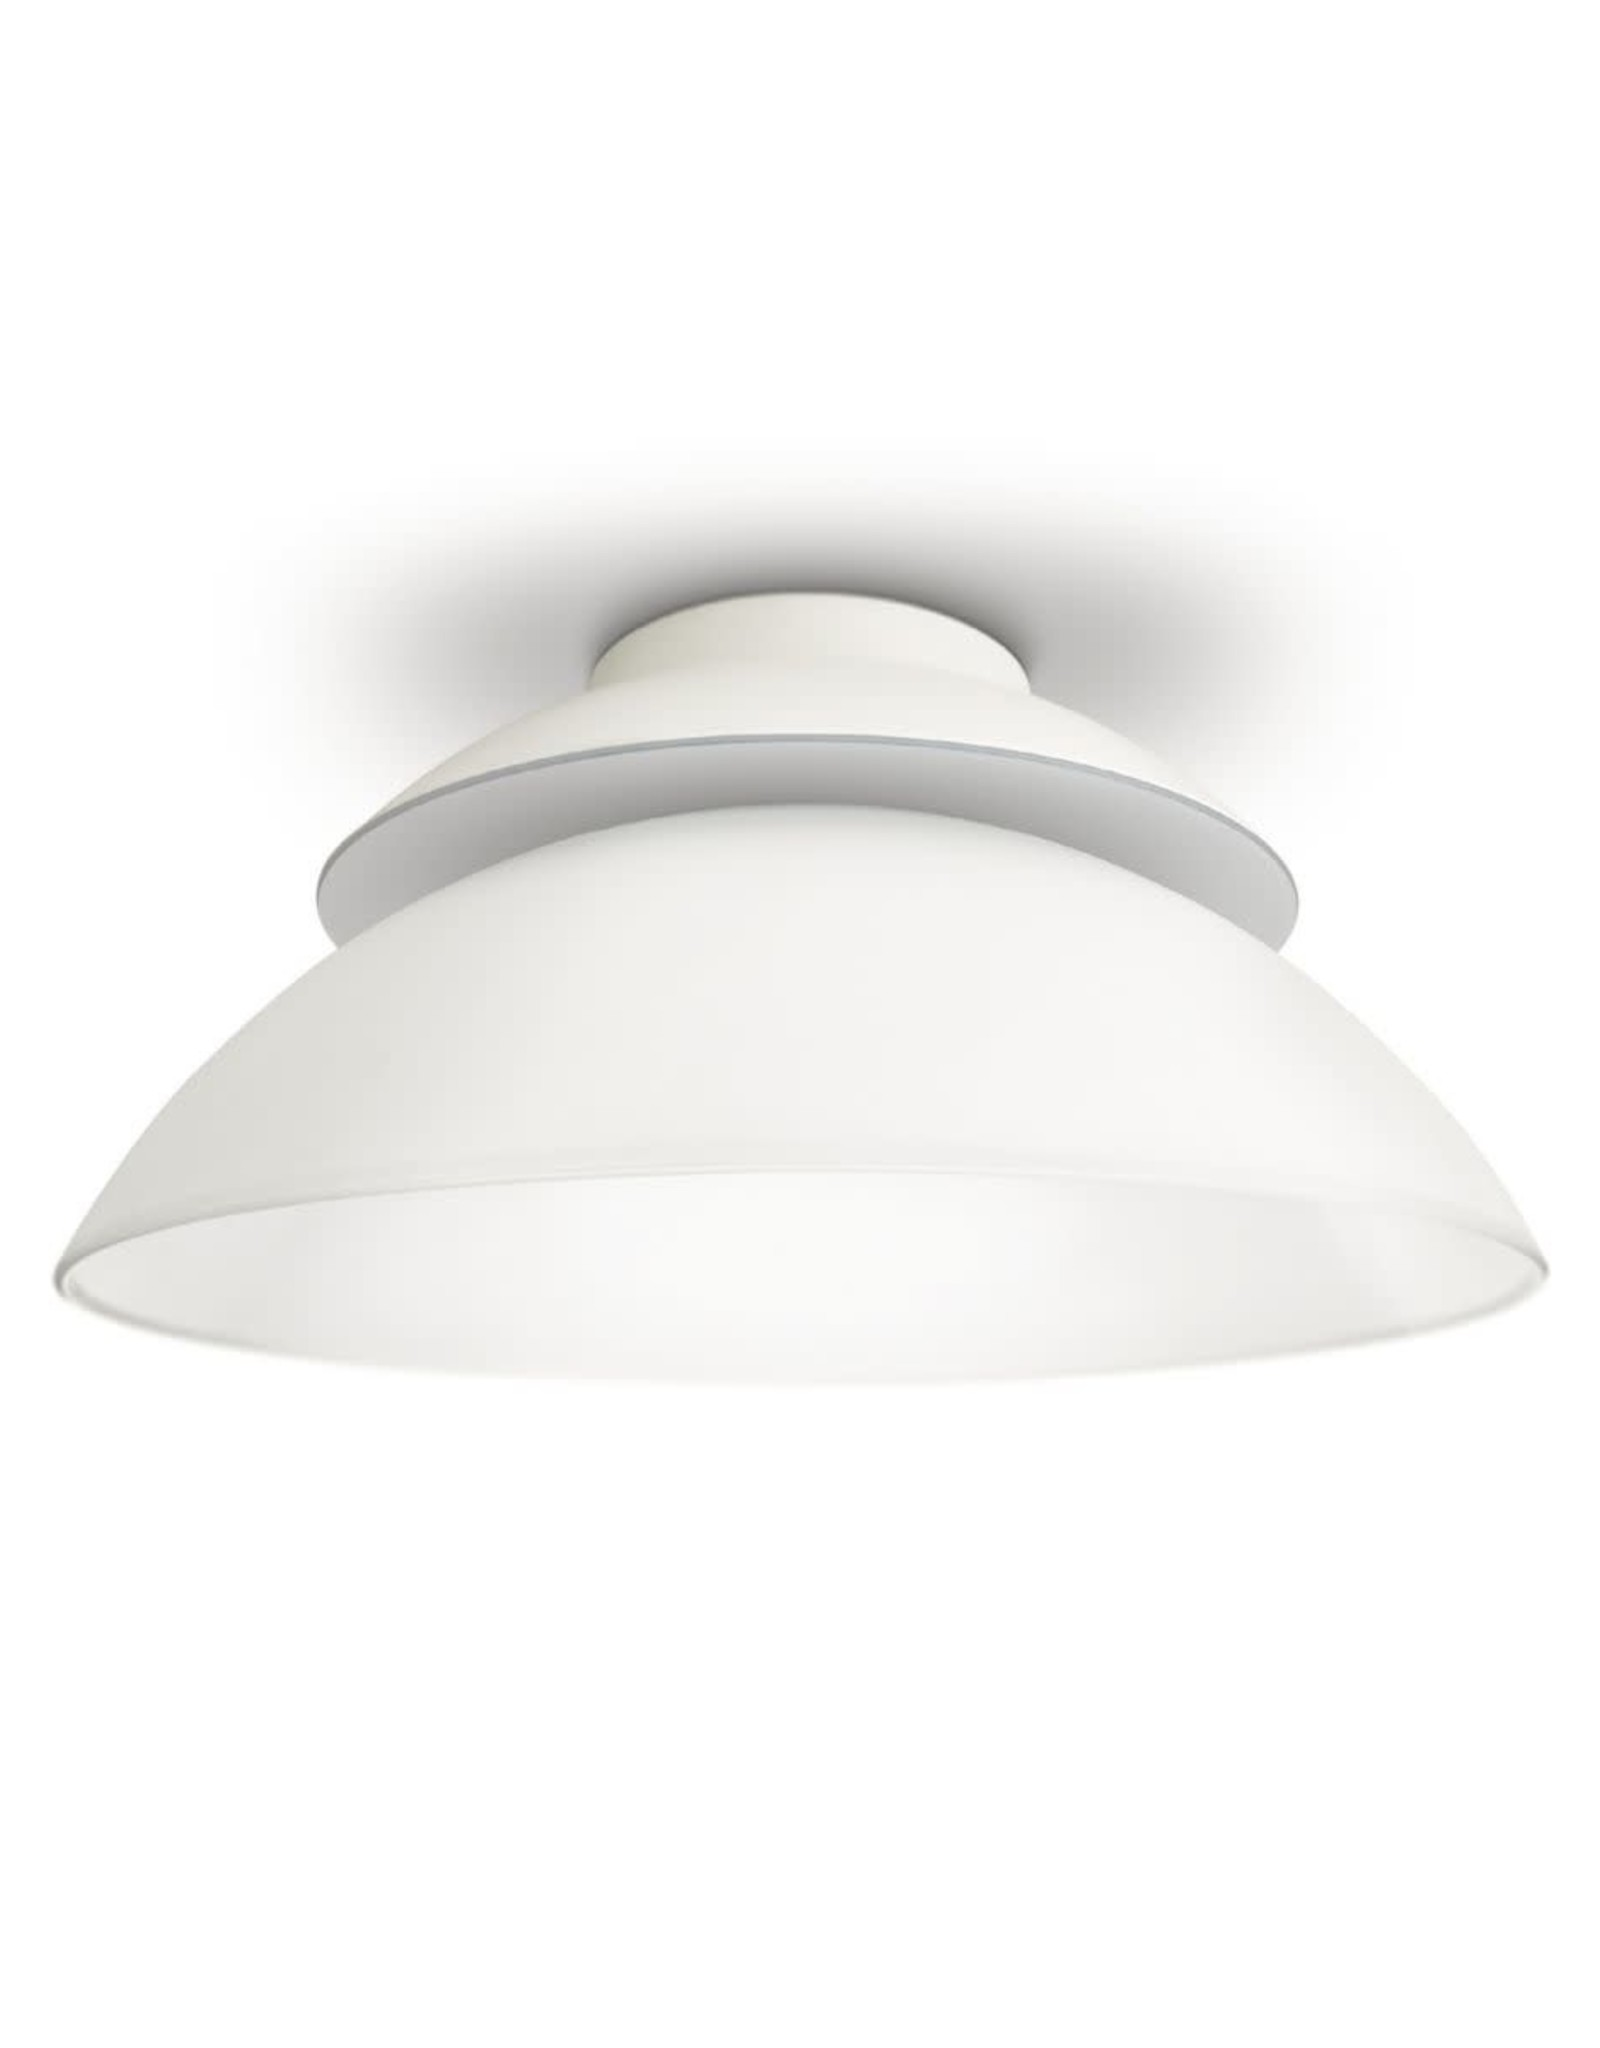 Philips Hue Philips Hue | Huebeyond Ceiling Lamp | 798108